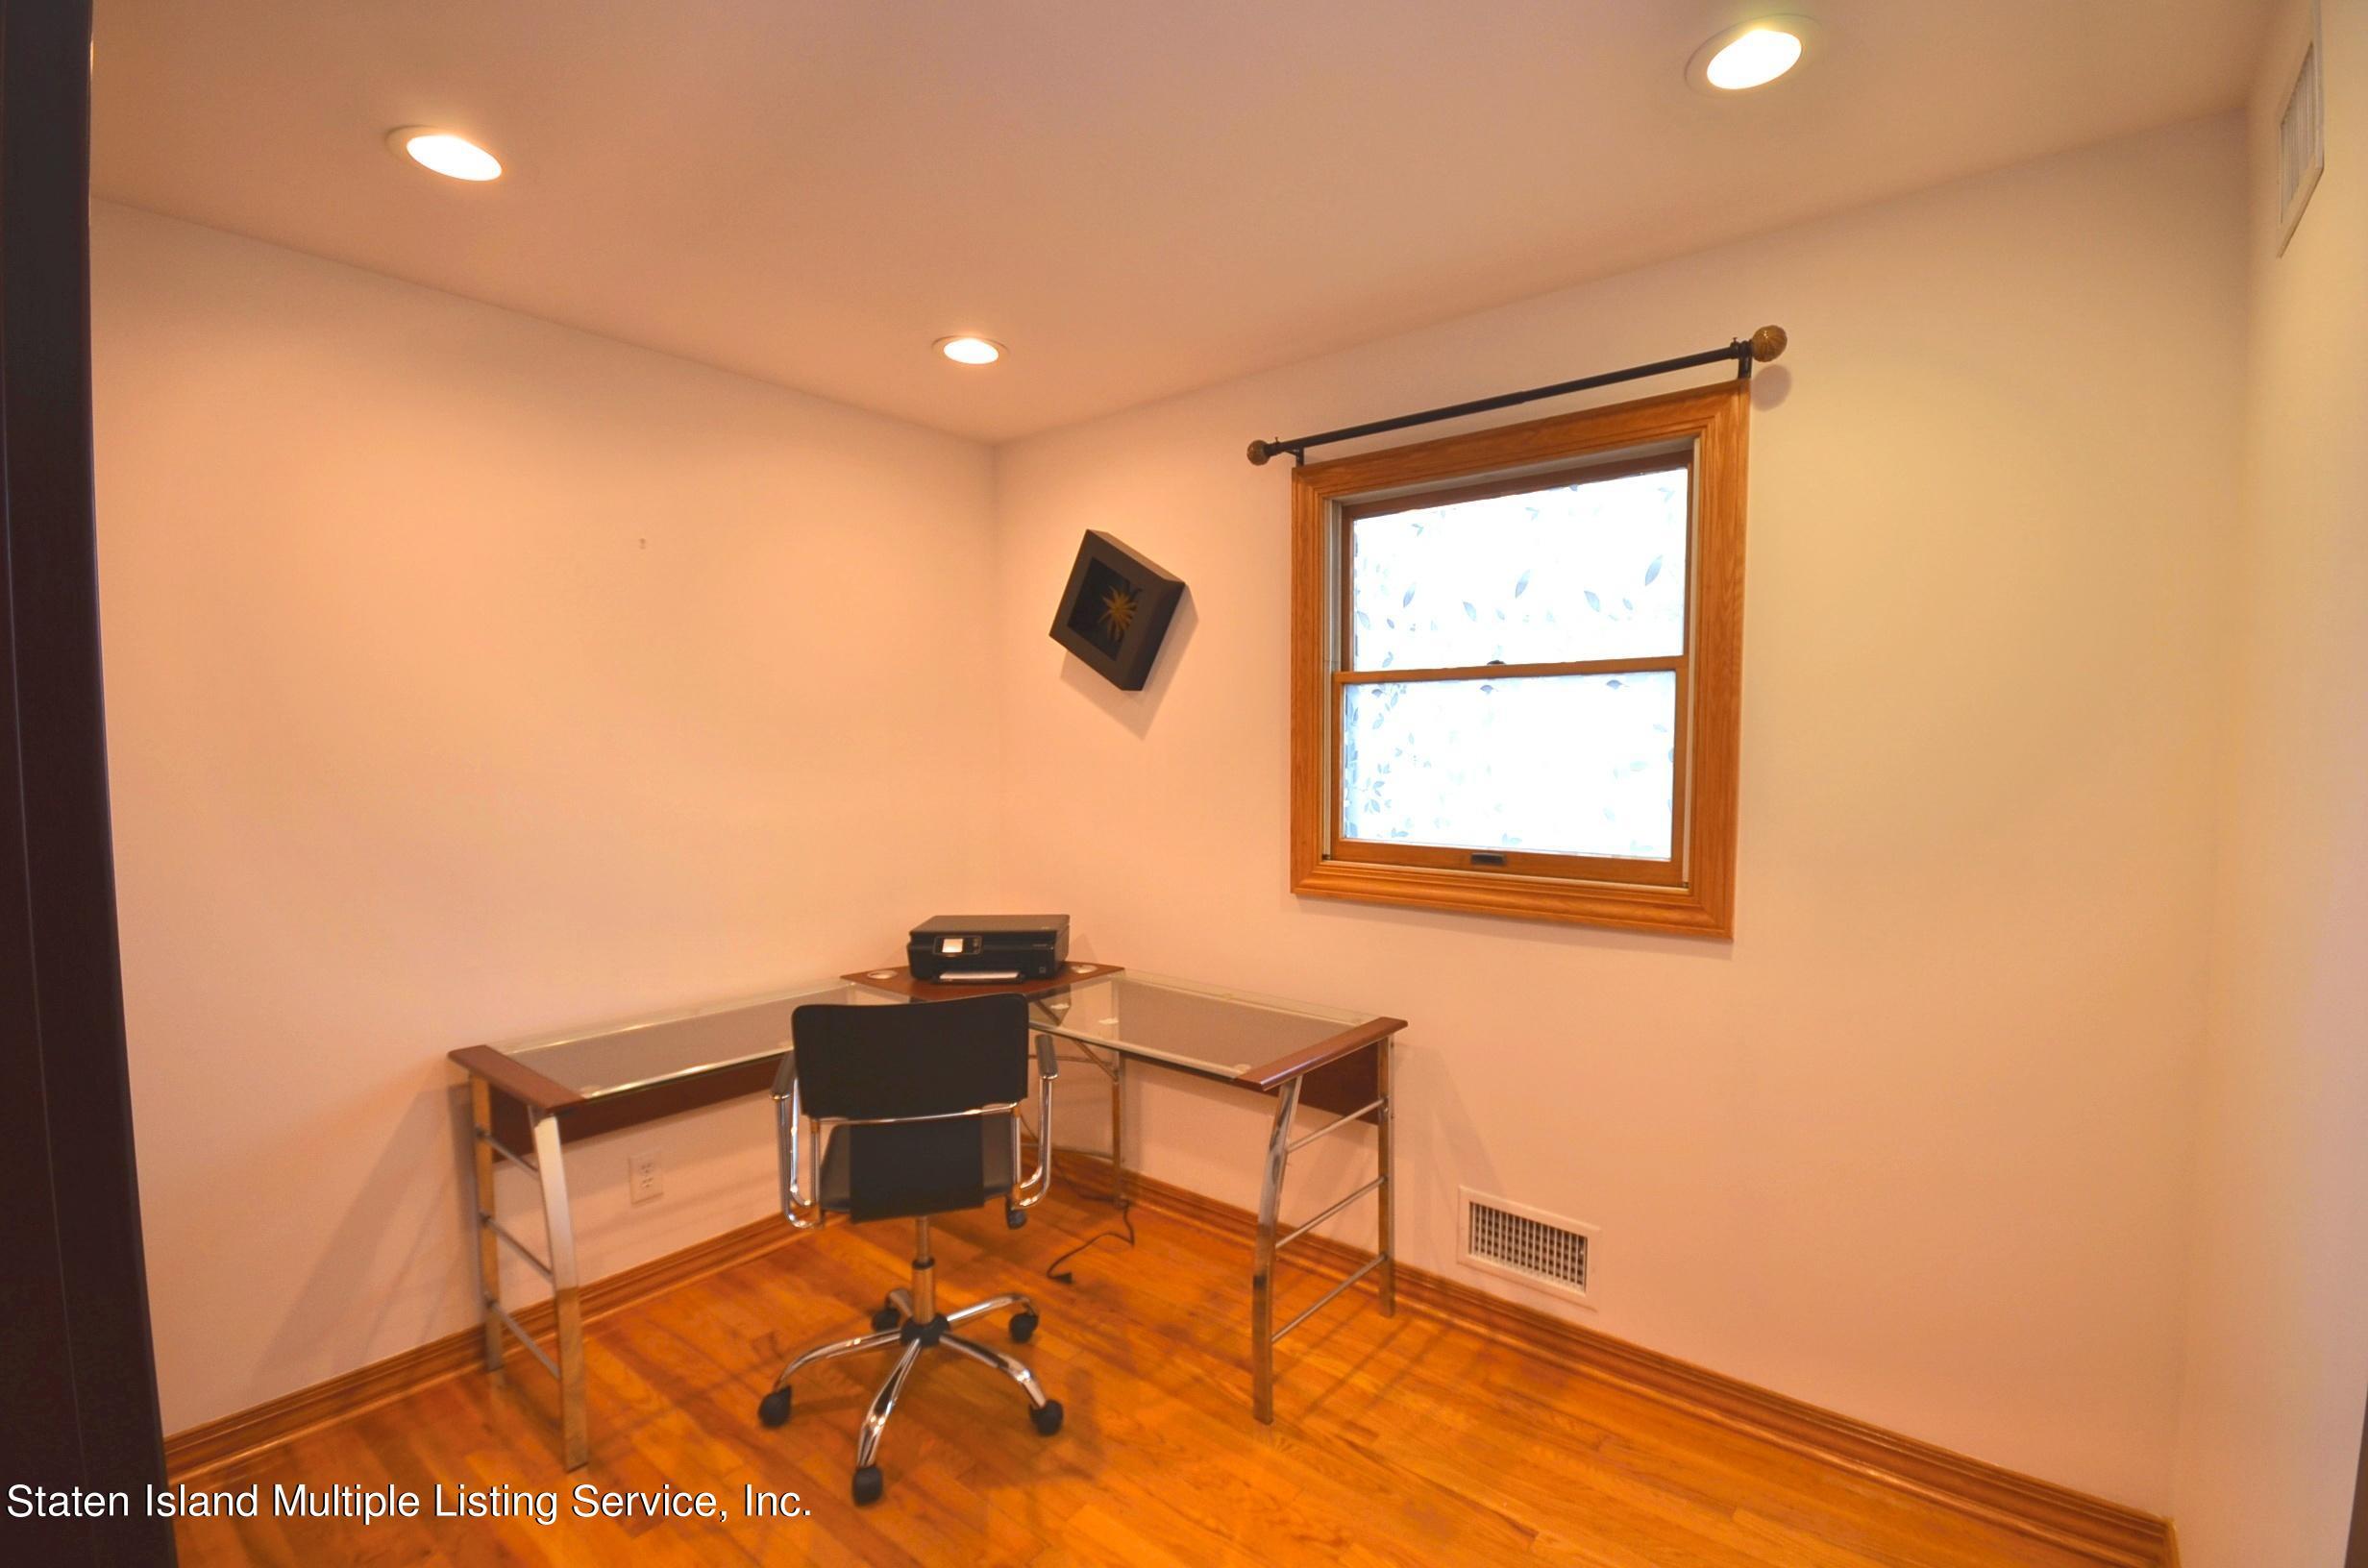 Single Family - Detached 48 Ocean Terrace  Staten Island, NY 10314, MLS-1142240-20